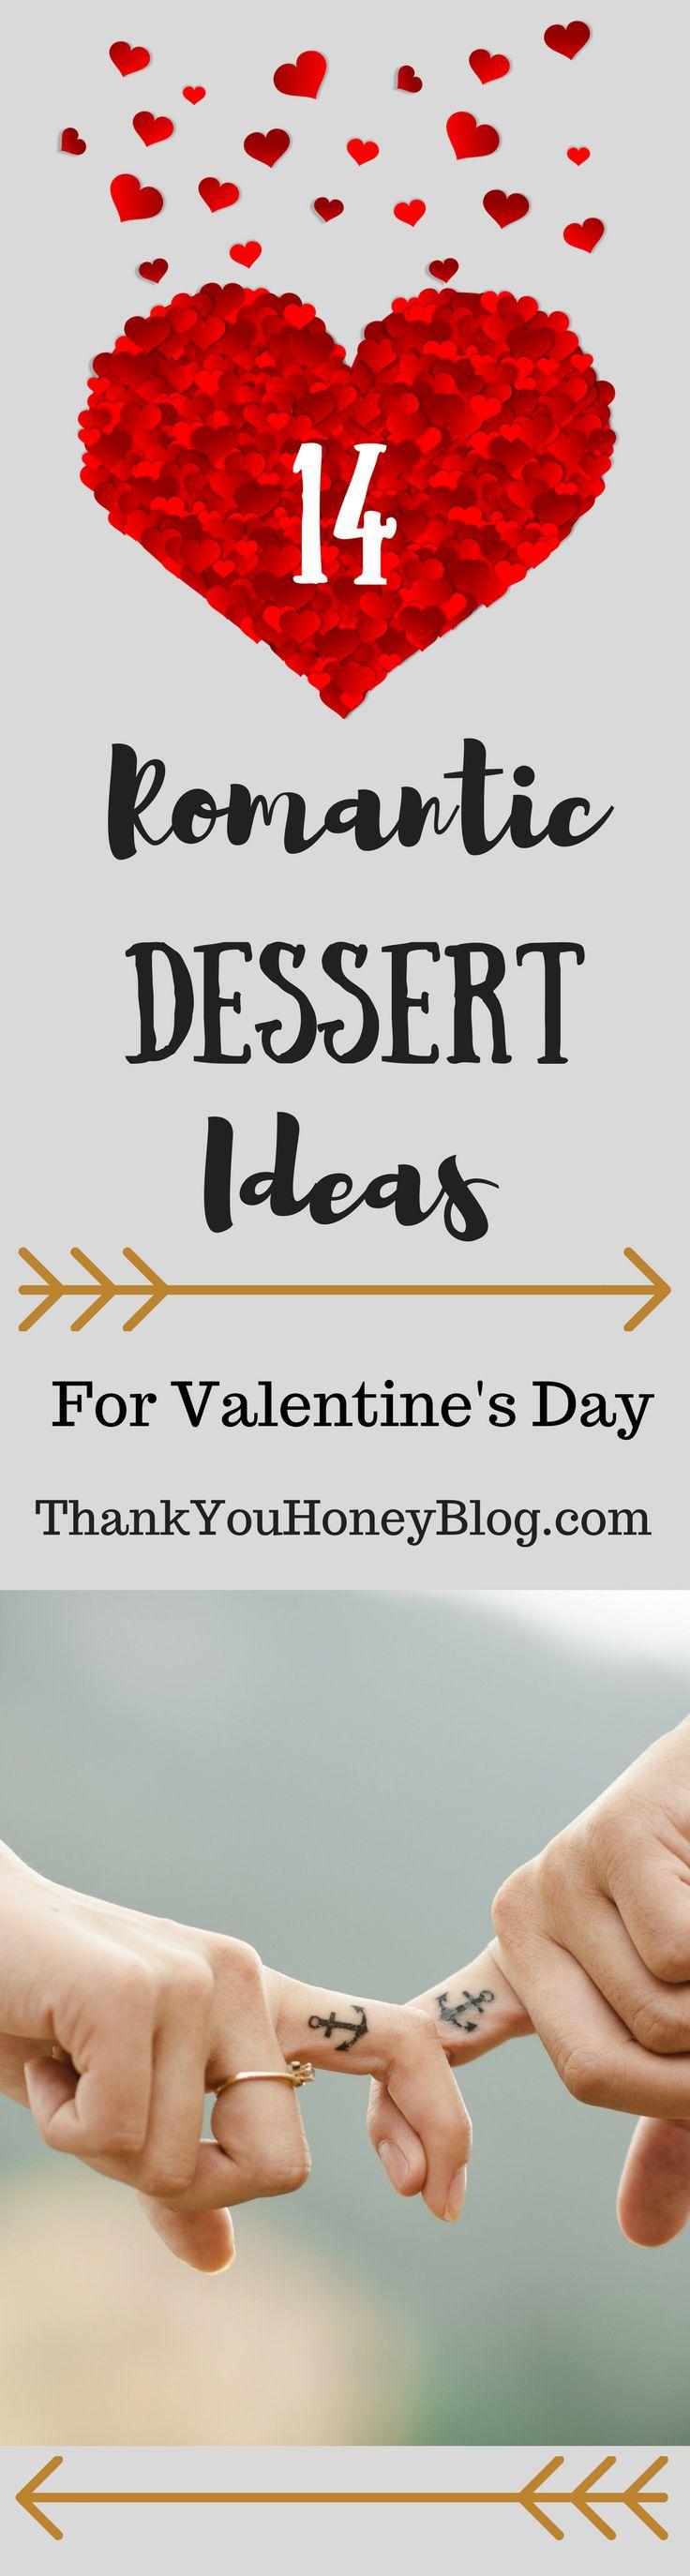 14 Romantic Dessert Ideas for Valentine's Day, #valentinesday, February 14, Dessert, Recipes,14 Romantic Dessert Ideas, #diy #datenight, #dessert, Ideas,